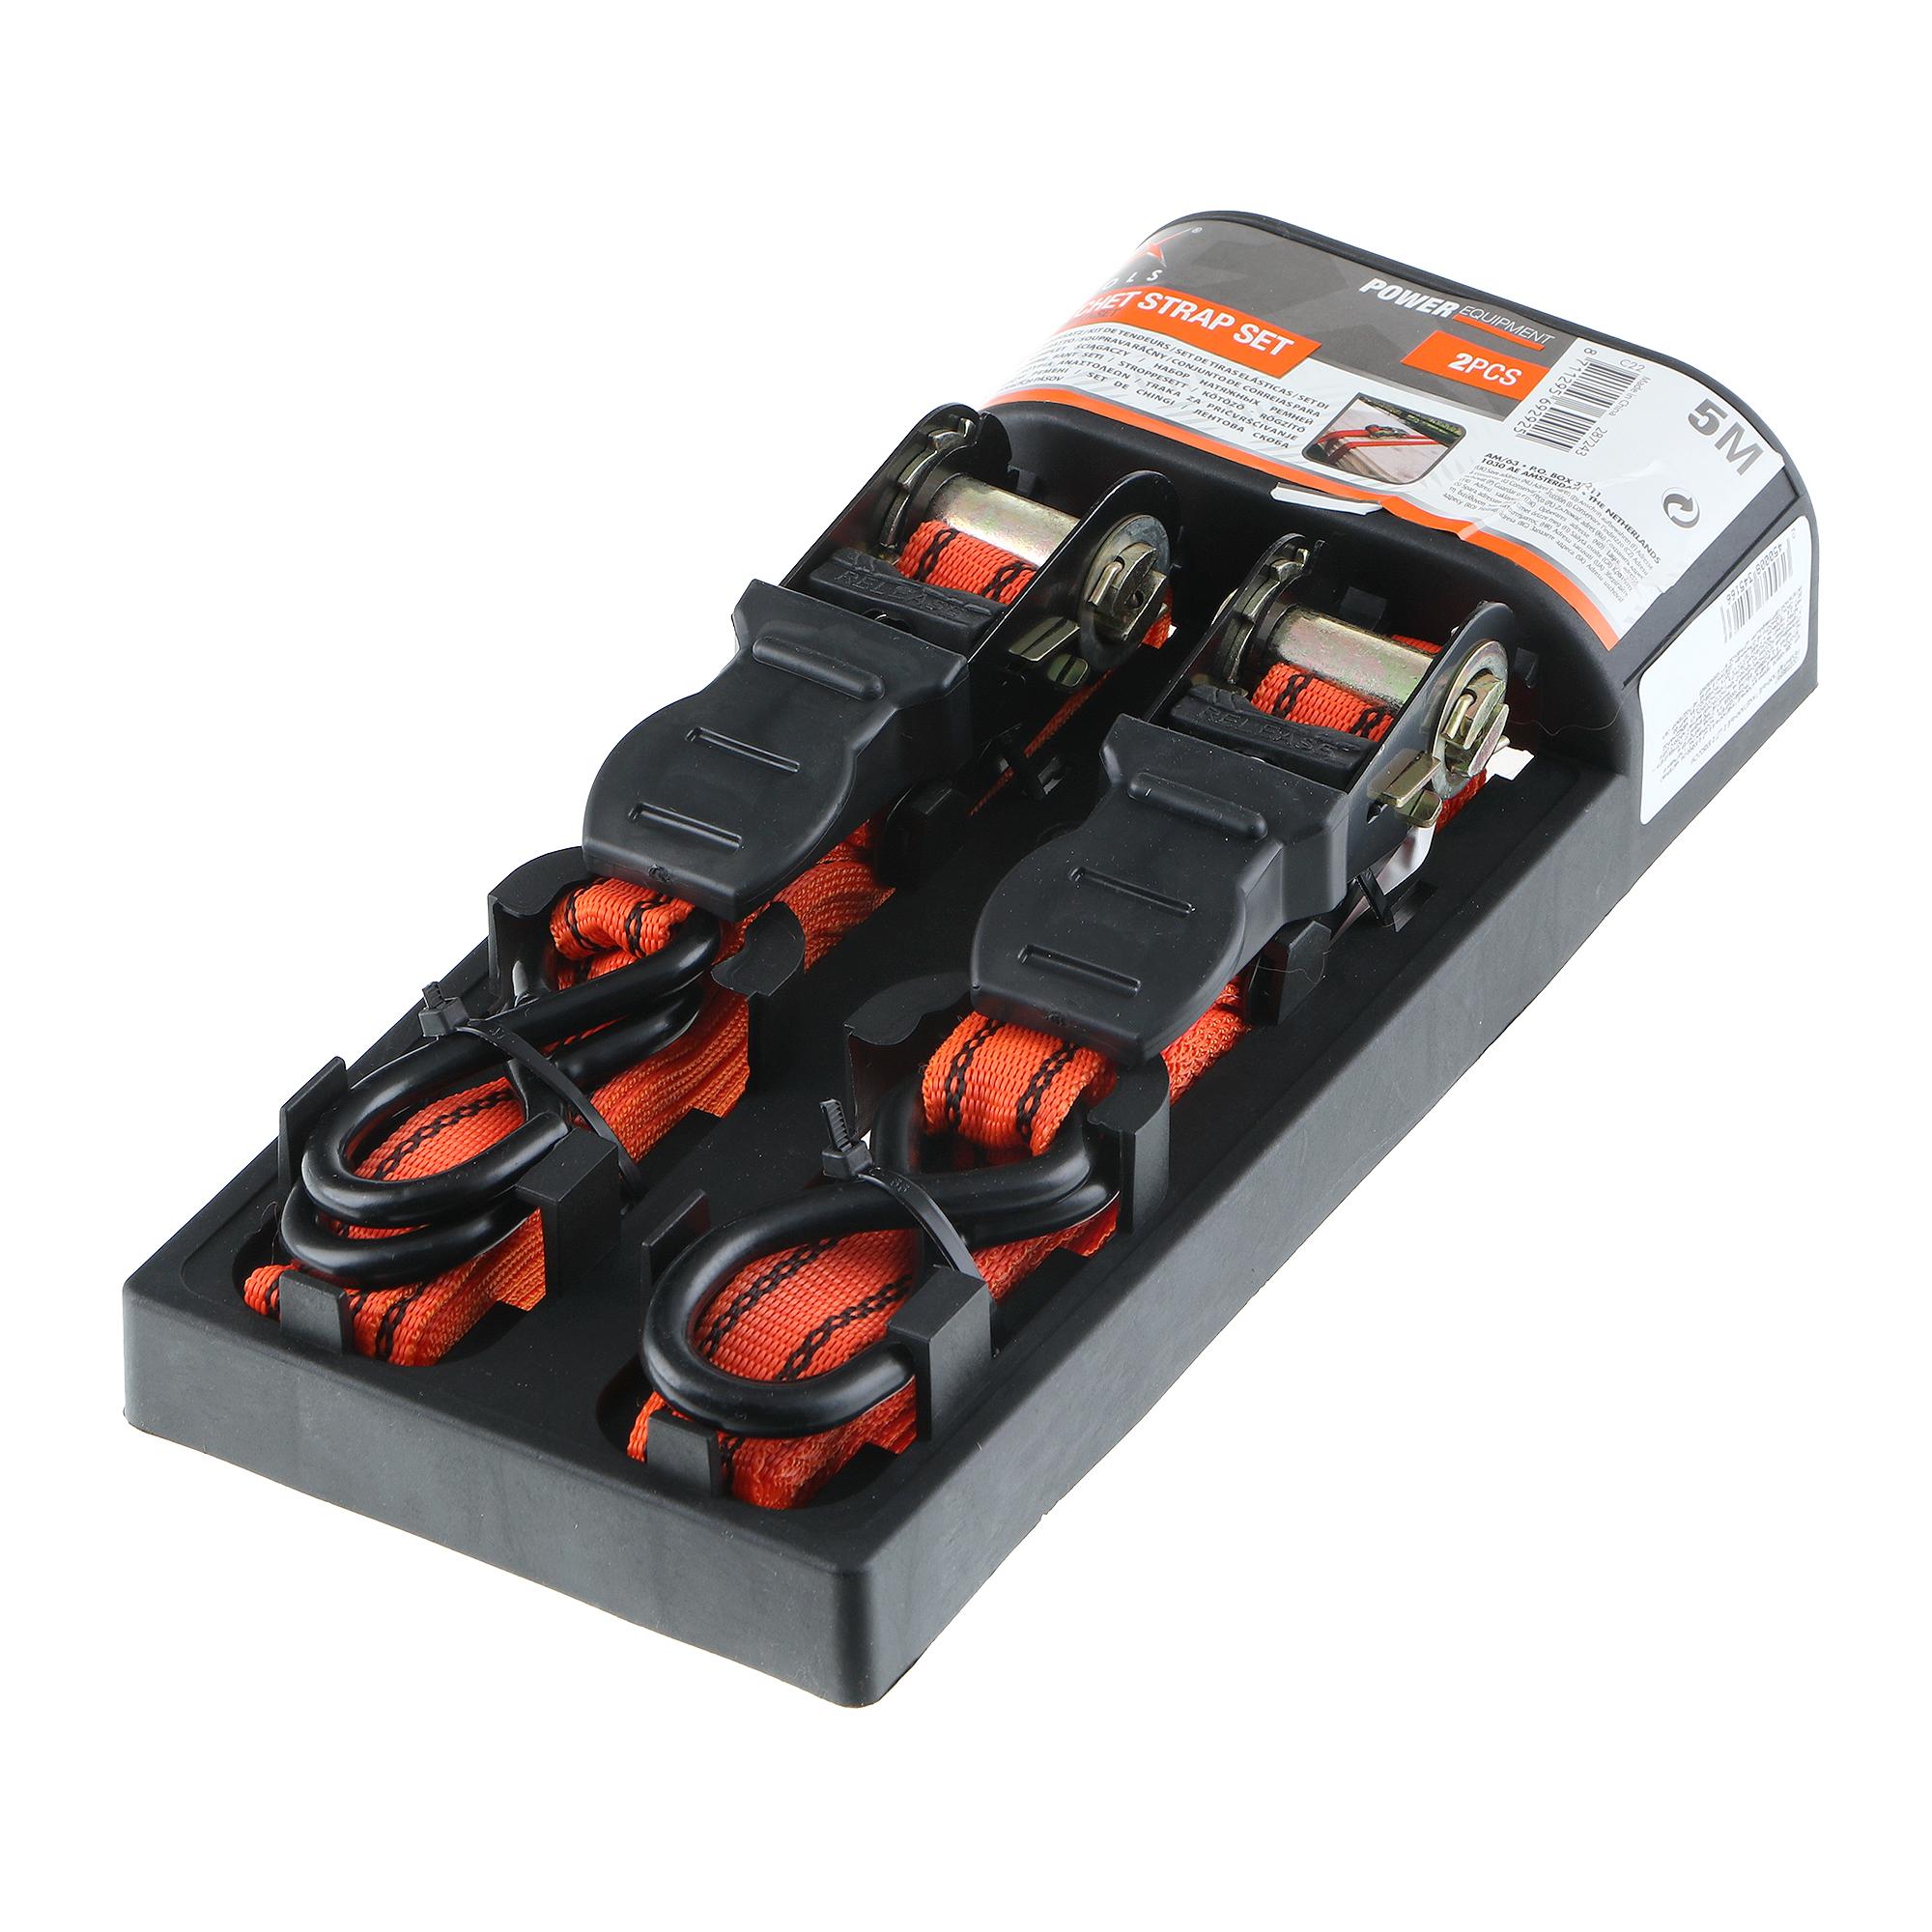 Ремни багажные такелажные Koopman 2 шт 2.5х500см